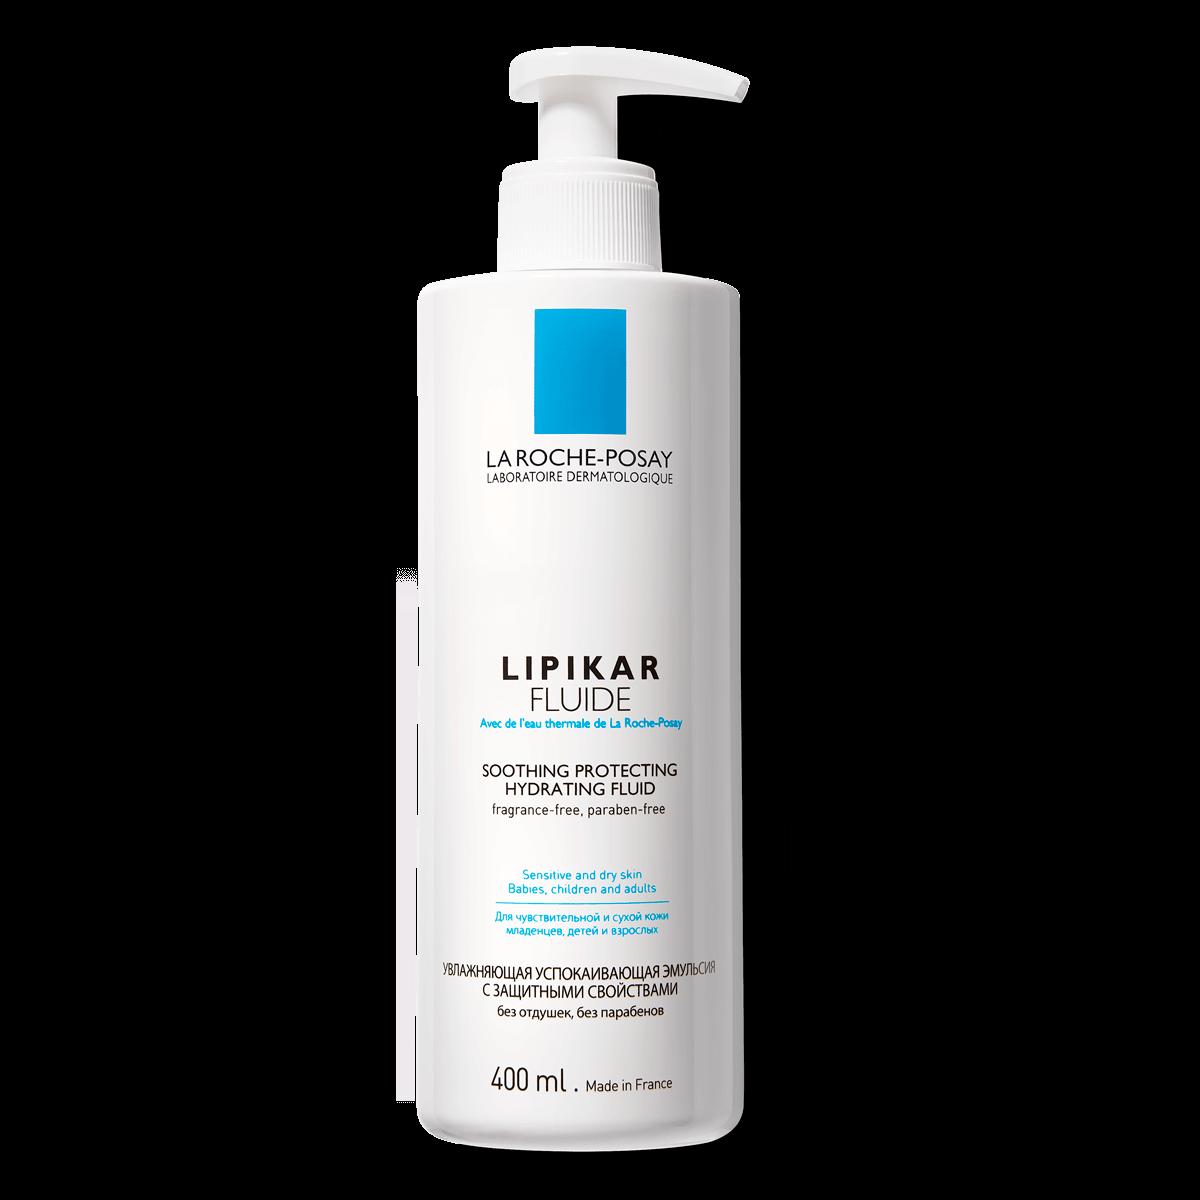 La Roche Posay ProductPage Eczema Lipikar Fluide 400ml 3337872420597 F